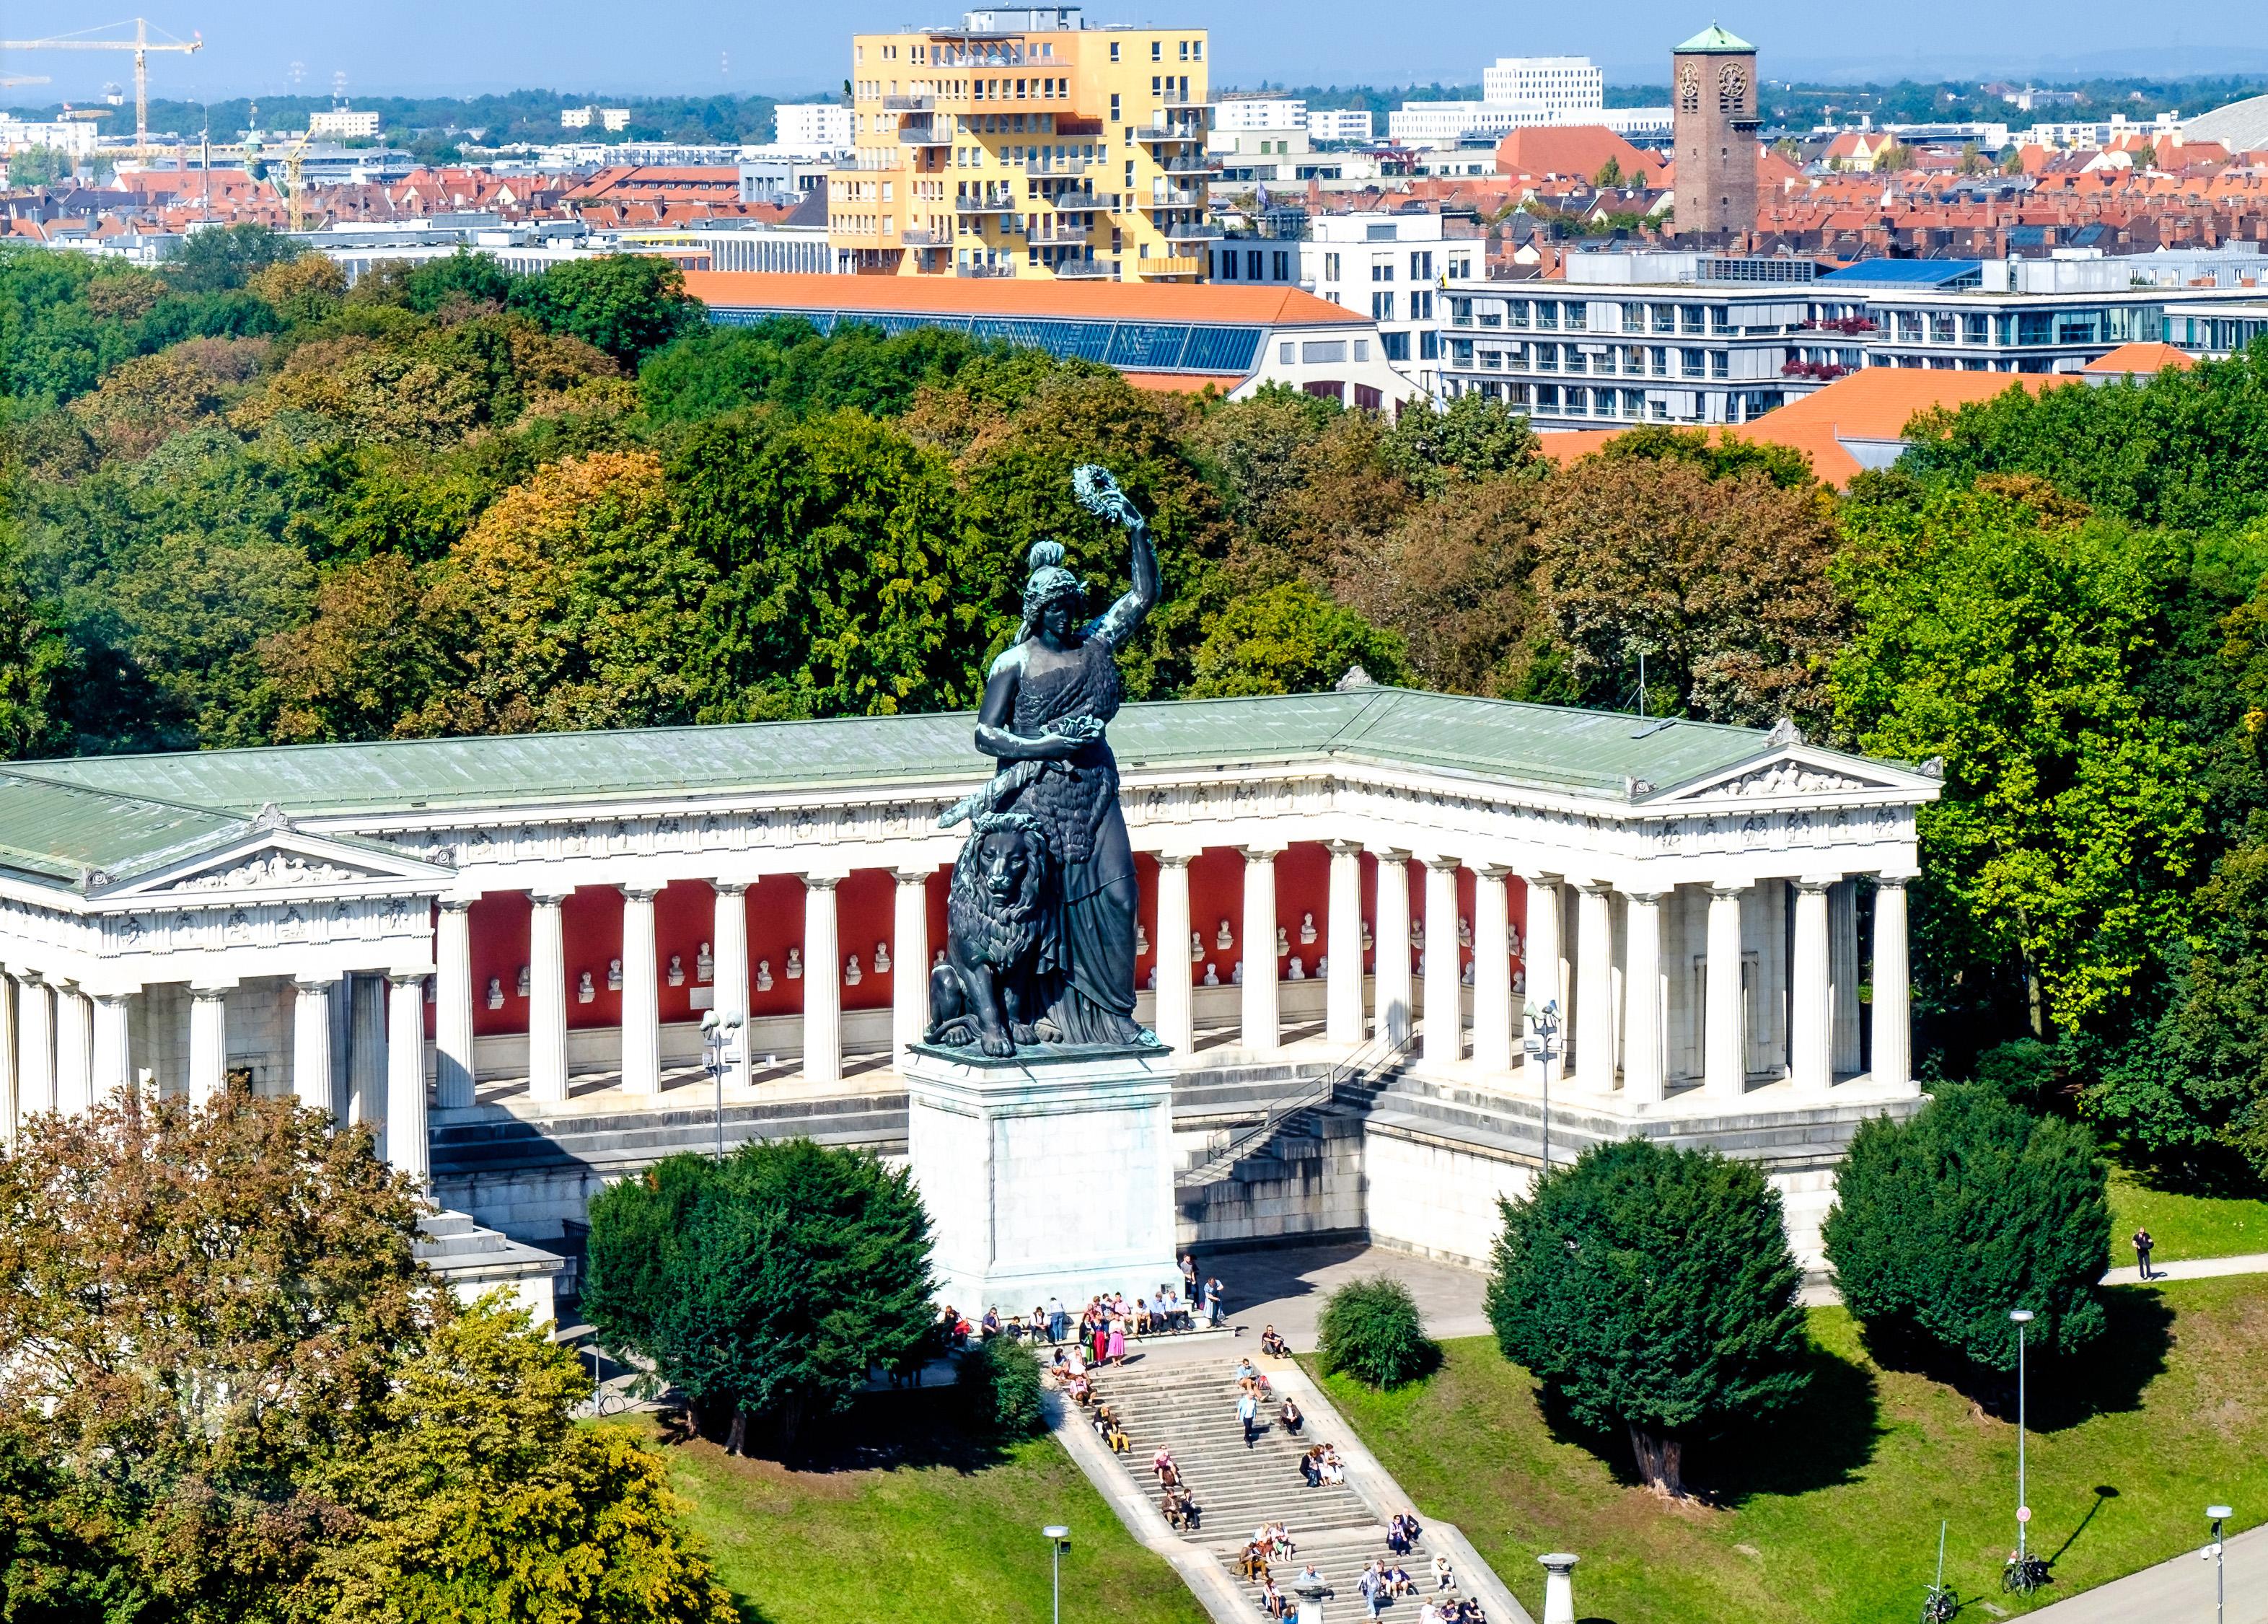 Bavaria Statue an der Theresienwiese